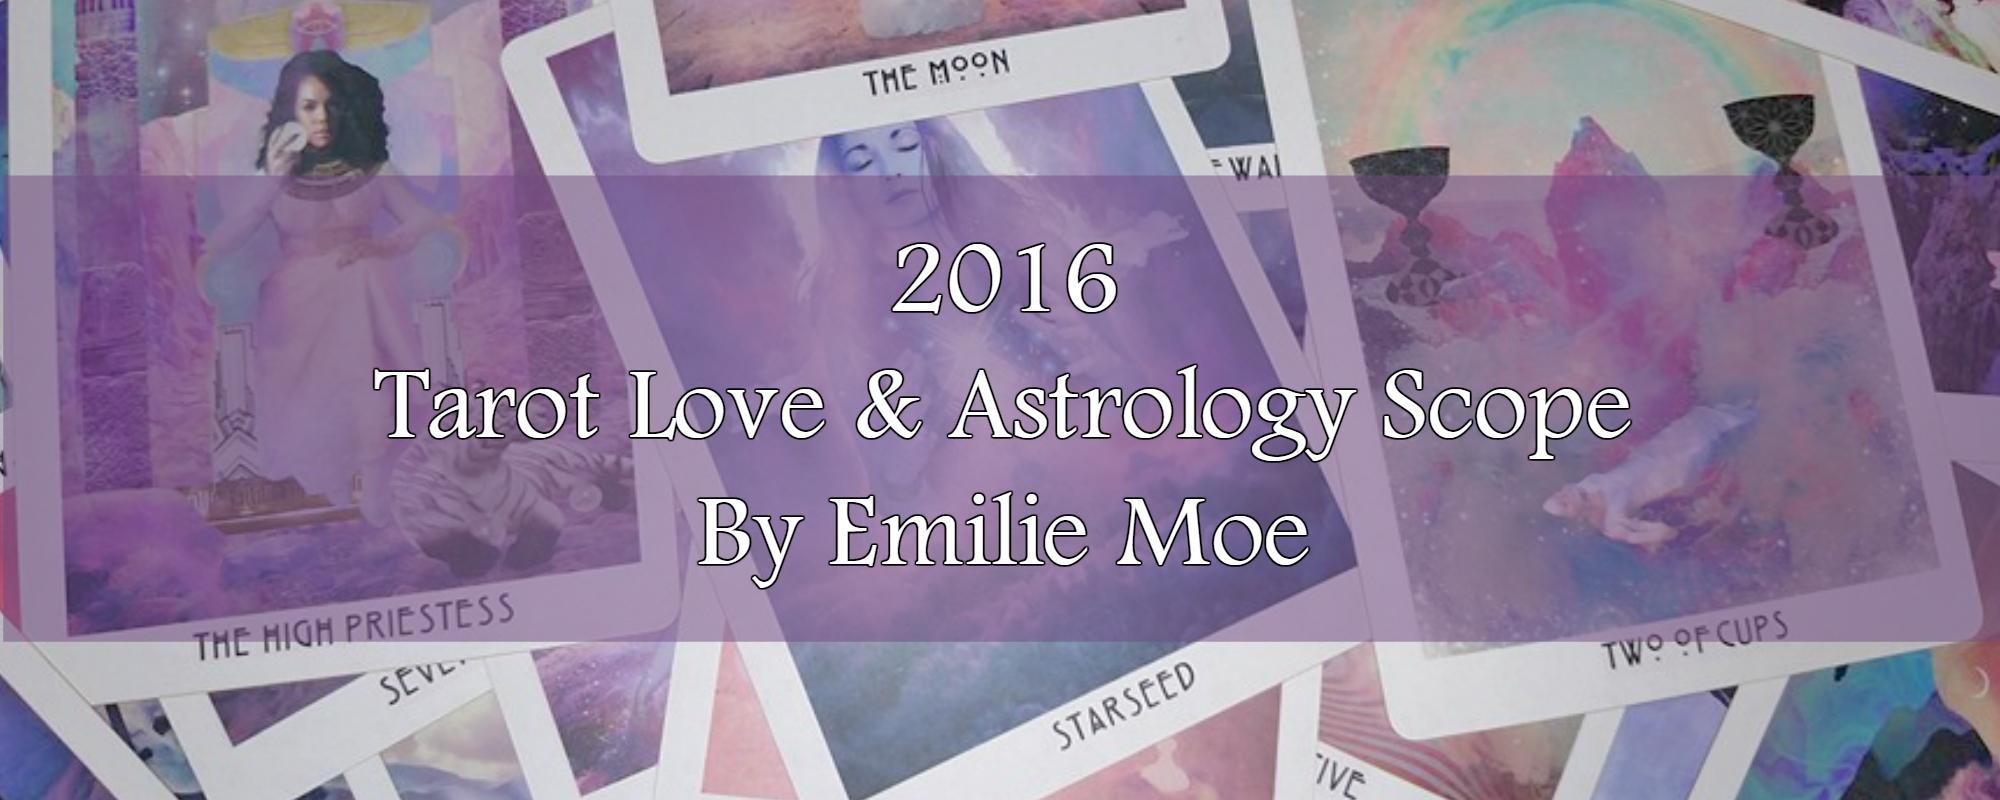 2016 Tarot Love & Astrology Scope